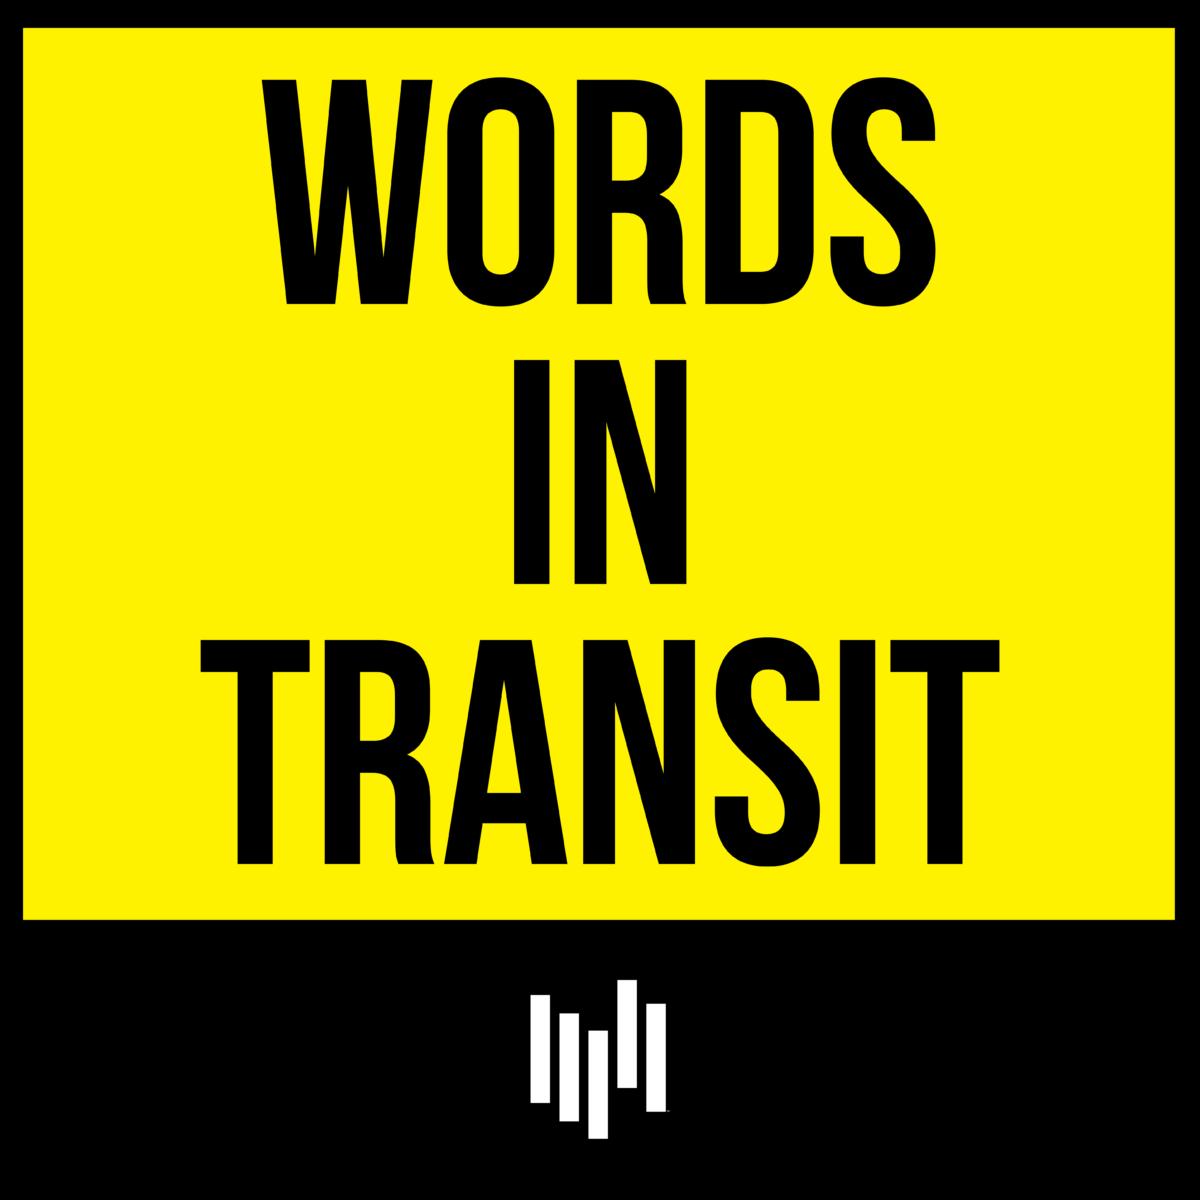 wordsintransit